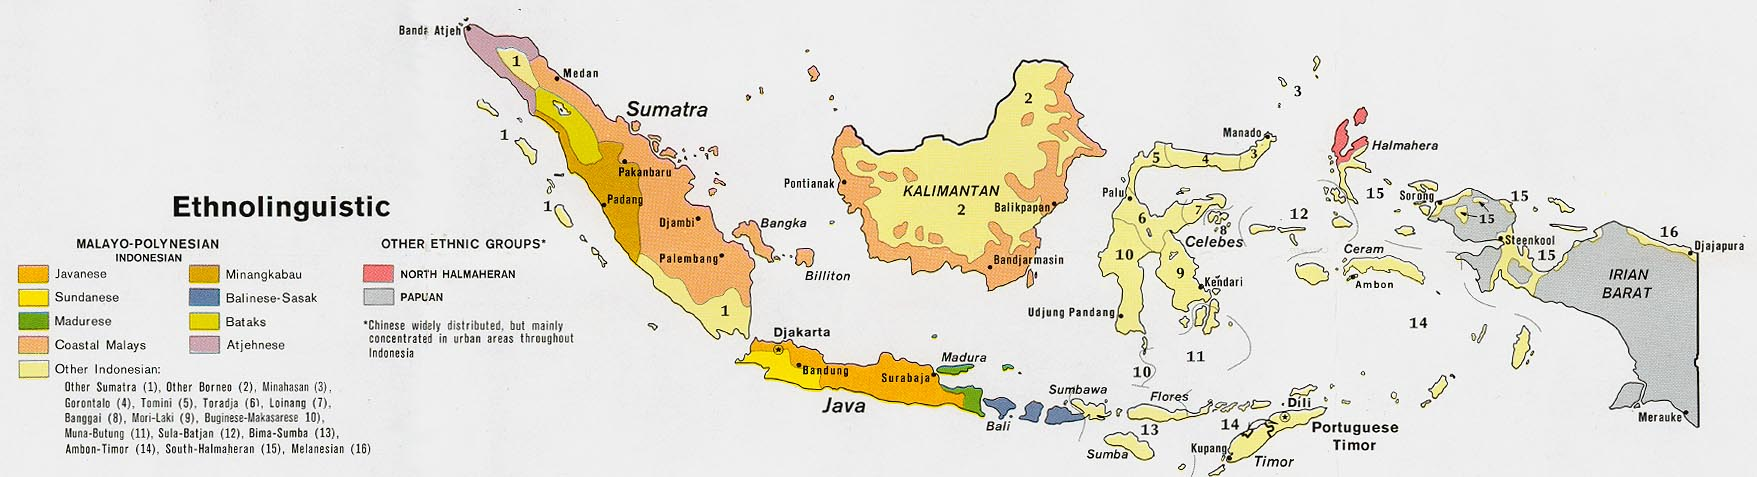 Climate Map Of Indonesia Indonesia - Ethnolinguistic